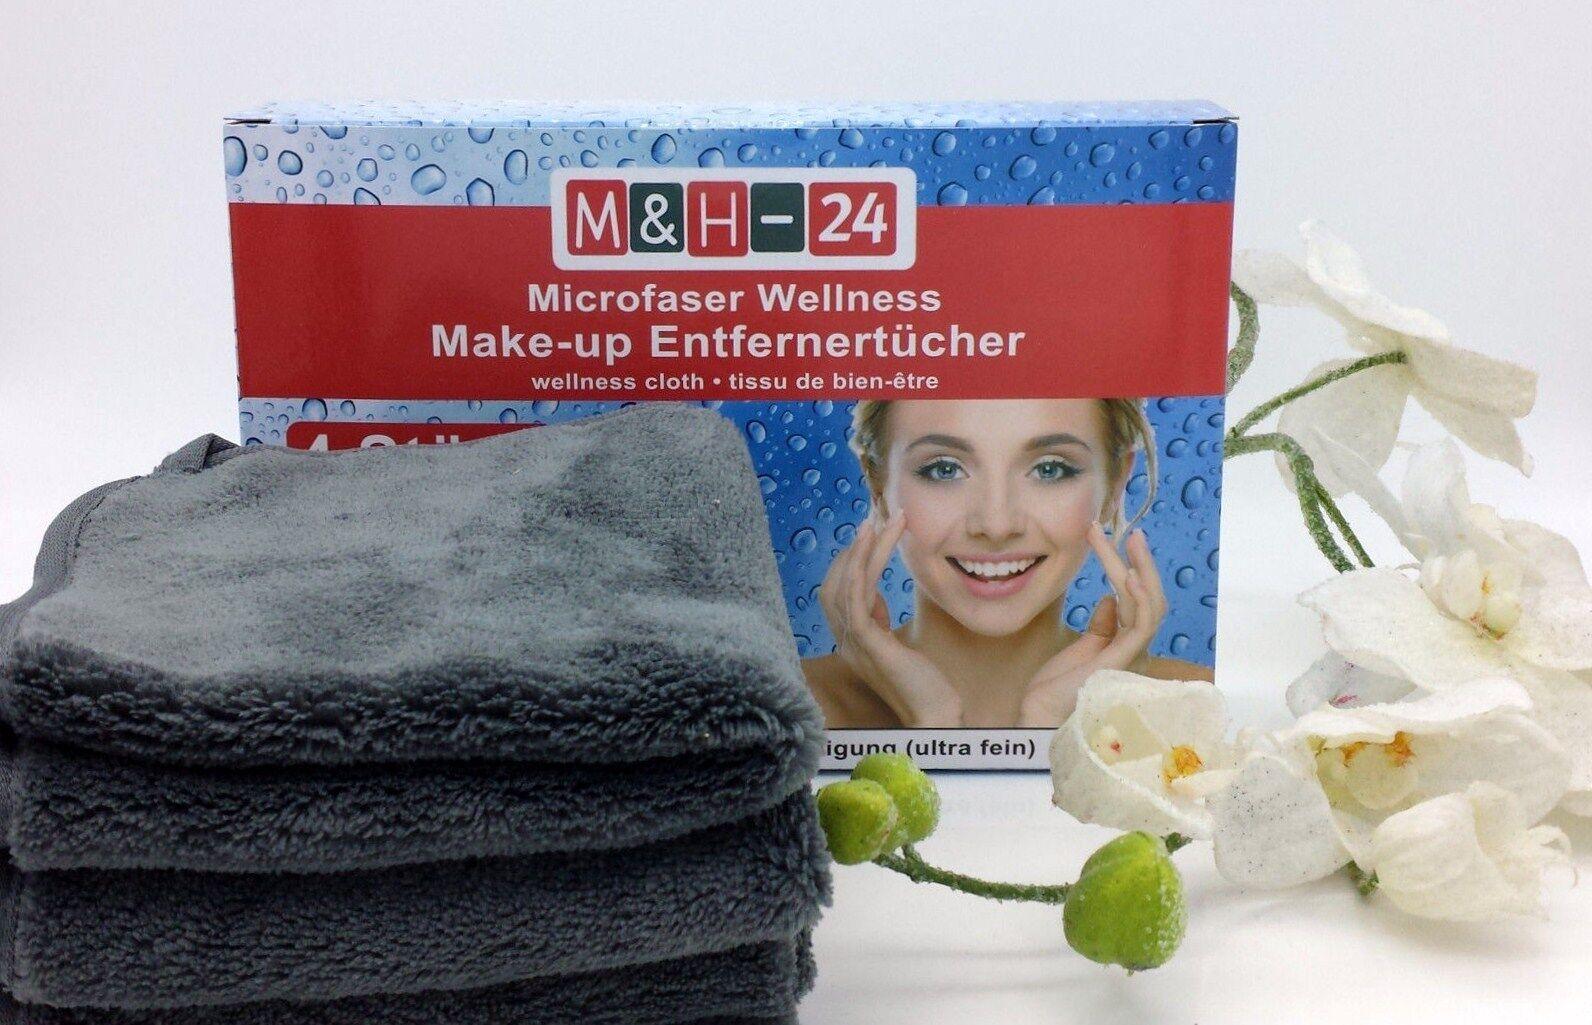 Mikrofaser Kosmetik Tücher Abschmink Tuch Peeling Gesichtsreinigung Make-up grau